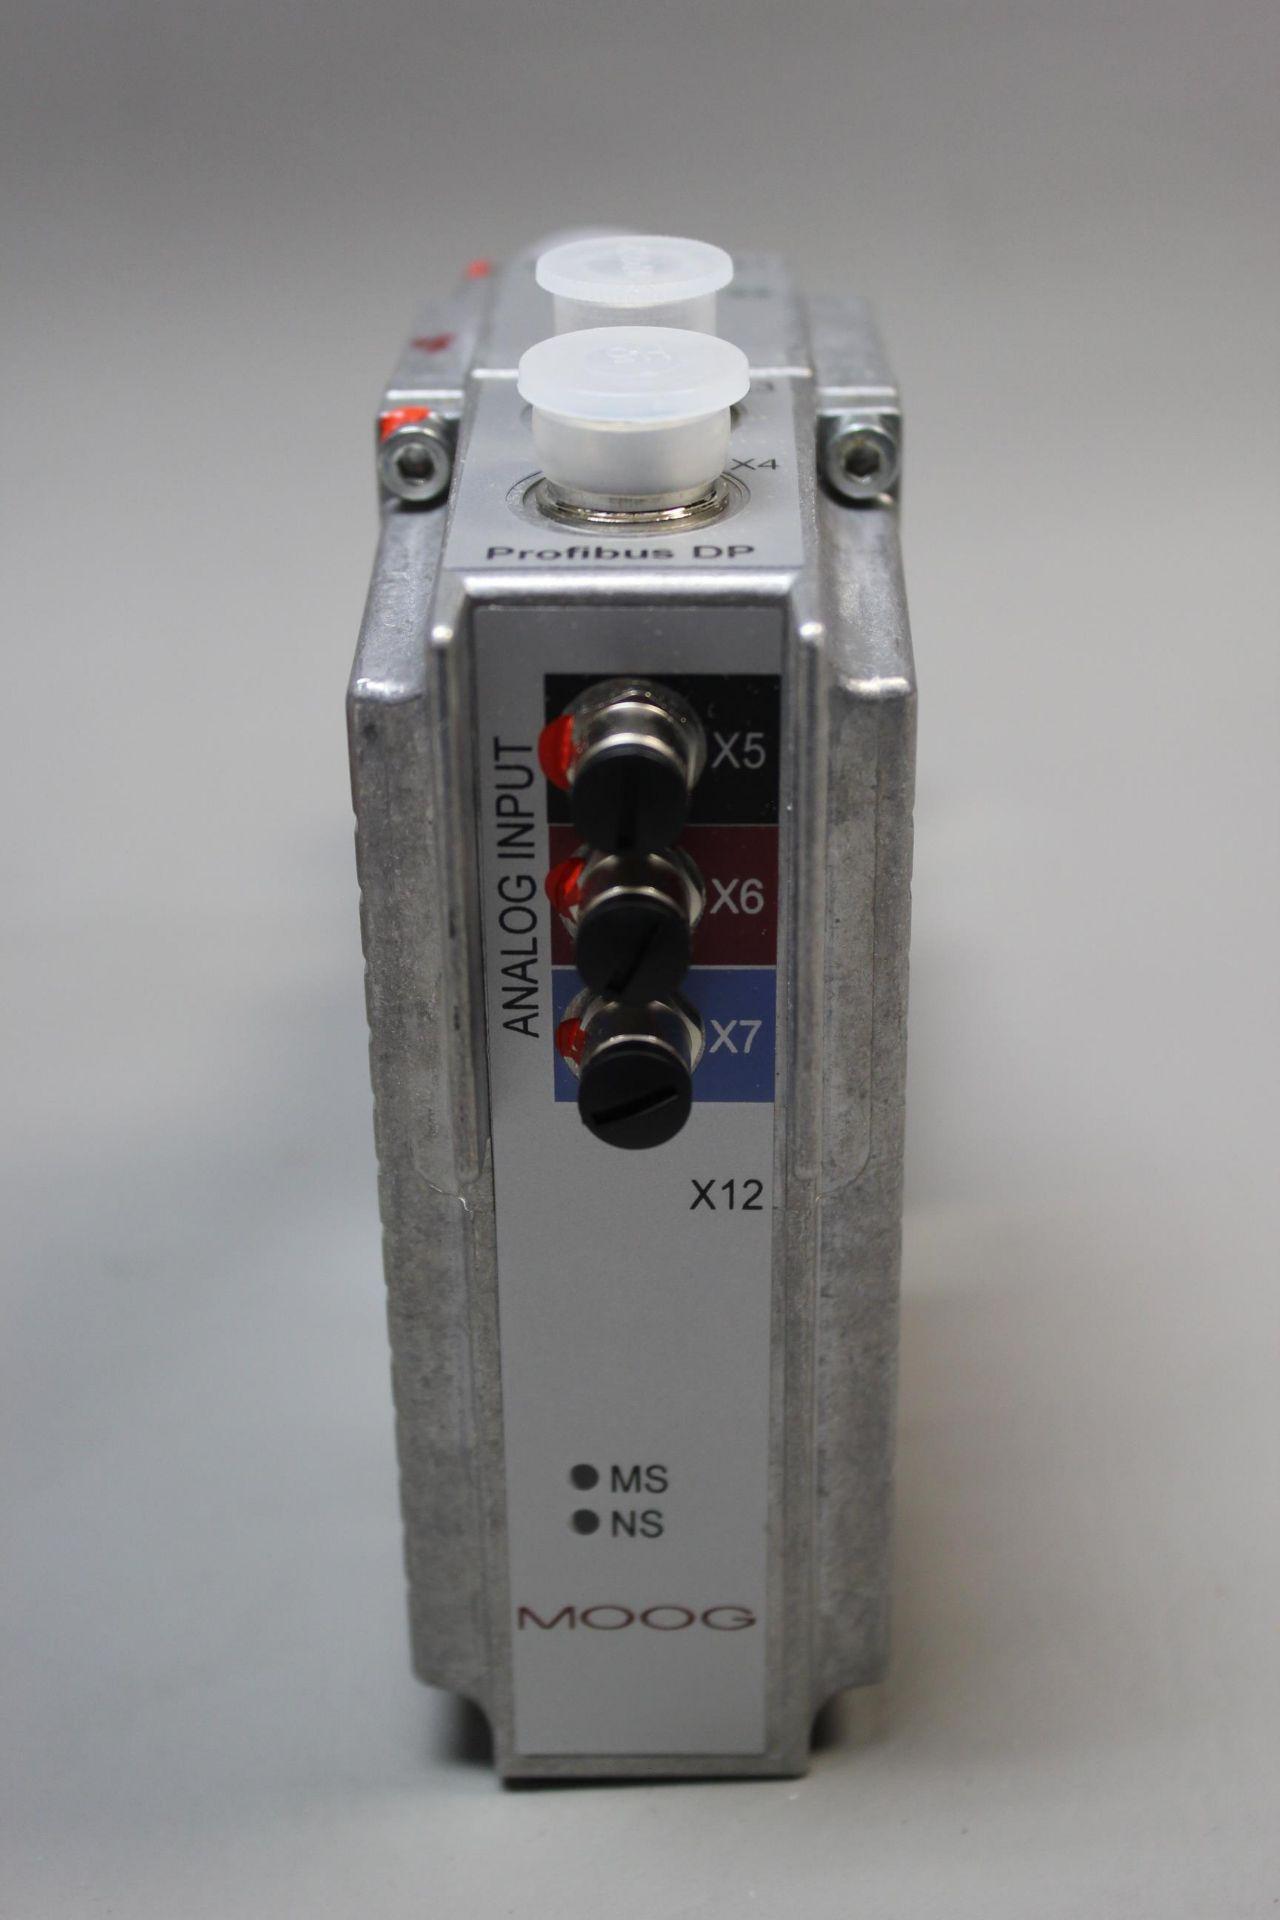 NEW MOOG DIRECT DRIVE DIGITAL CONTROL HYDRAULIC SERVO VALVE - Image 9 of 12